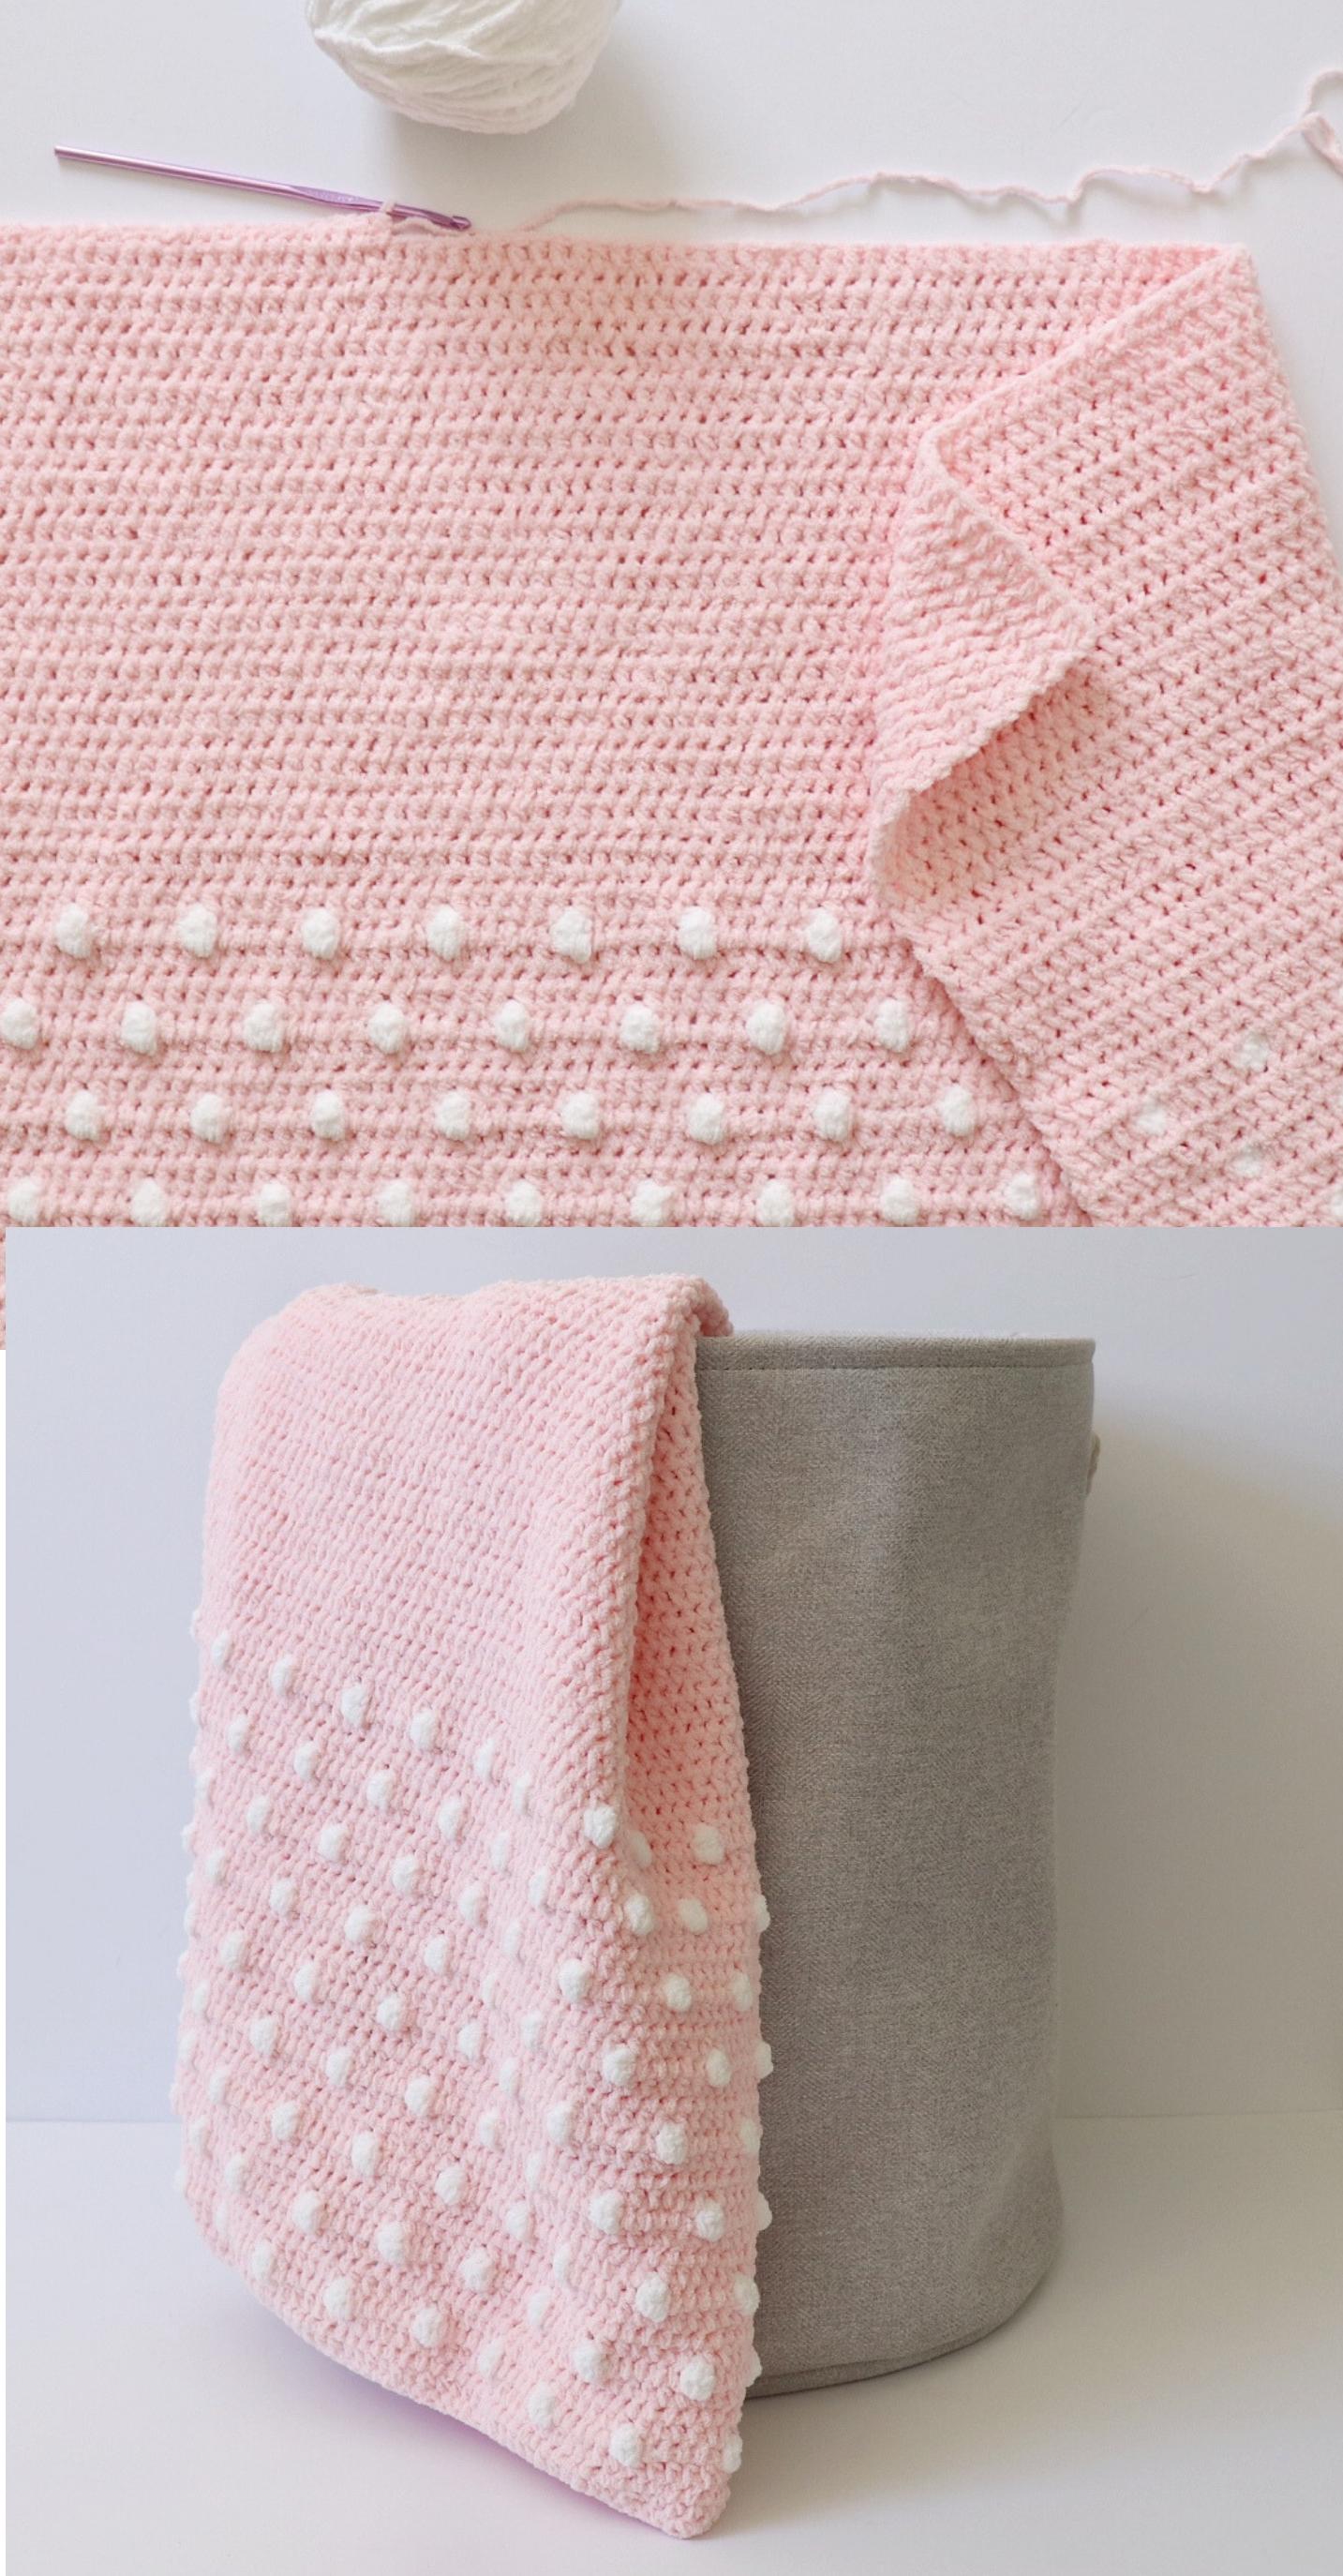 Free Pattern - Crochet Polka Dot Ends Baby Blanket #babyblanket